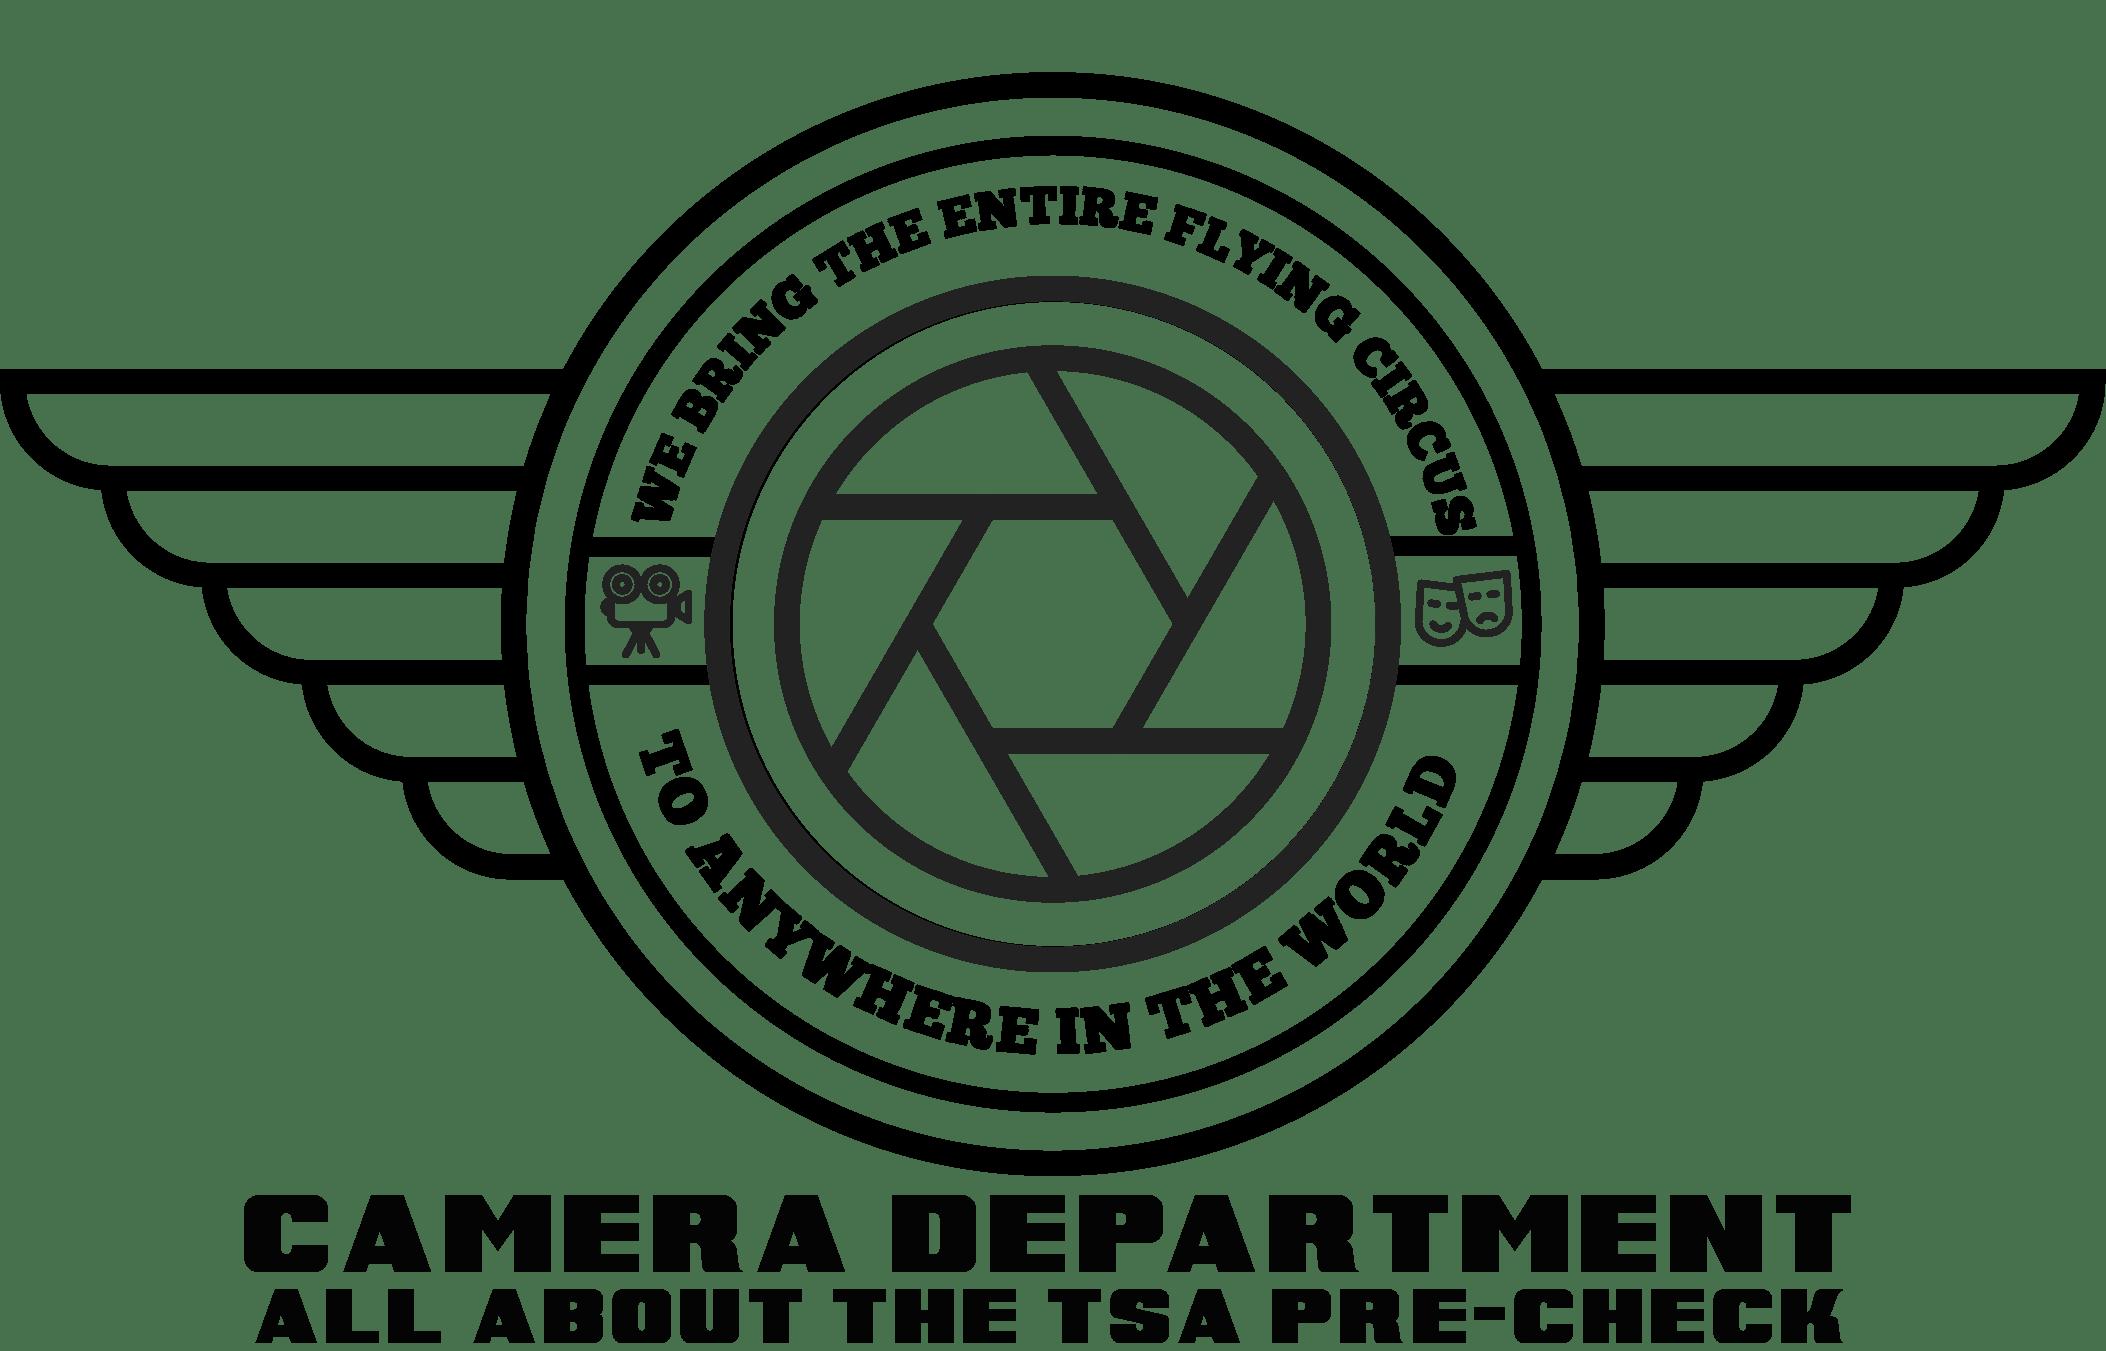 CAMERA DEPARTMENT — MANTARAY.MEDIA